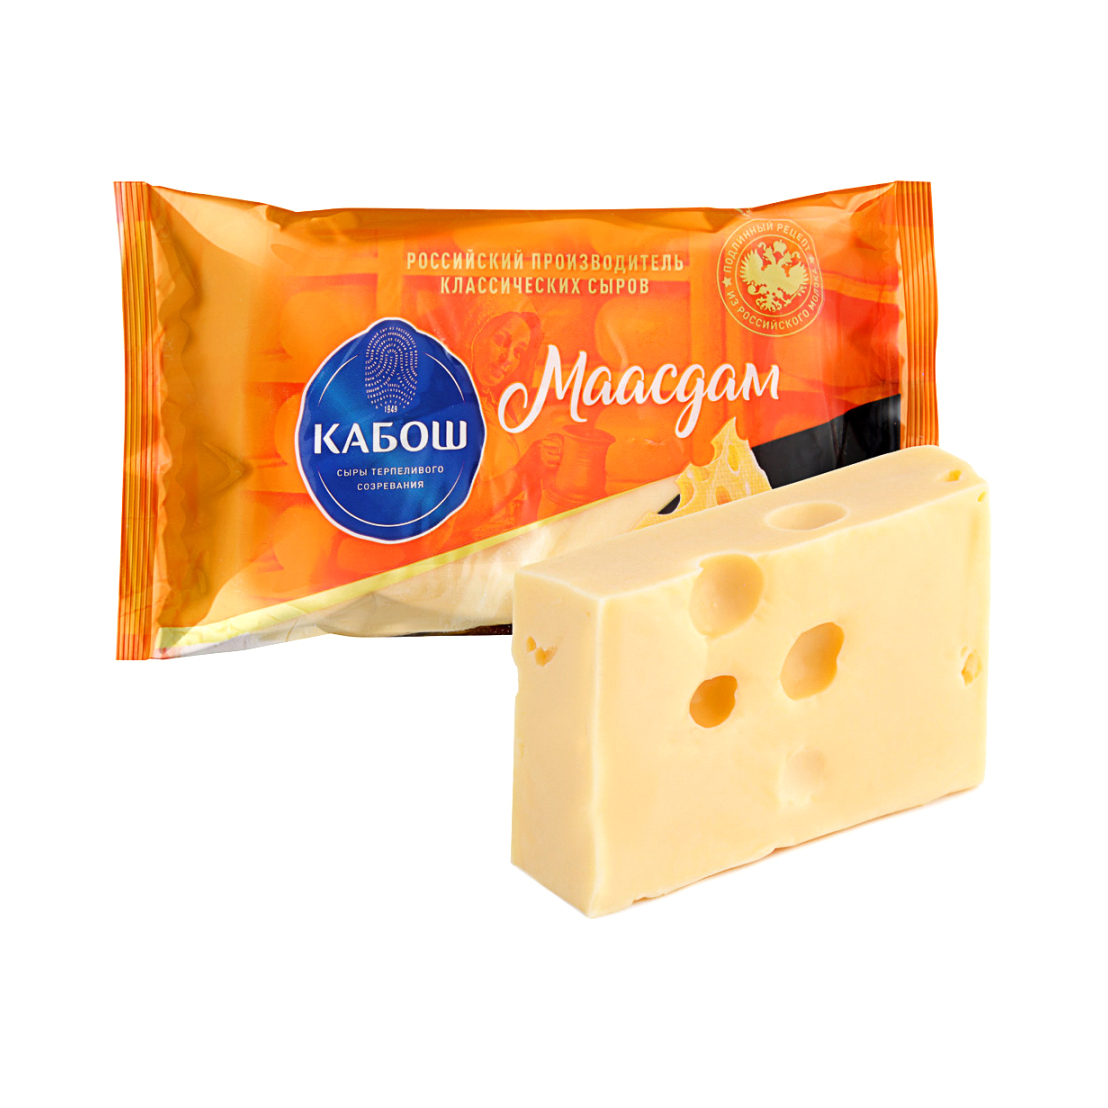 Фото - Сыр Кабош Маасдам 45%, 220 г сыр твердый кабош чеддер красный 49% 200 г